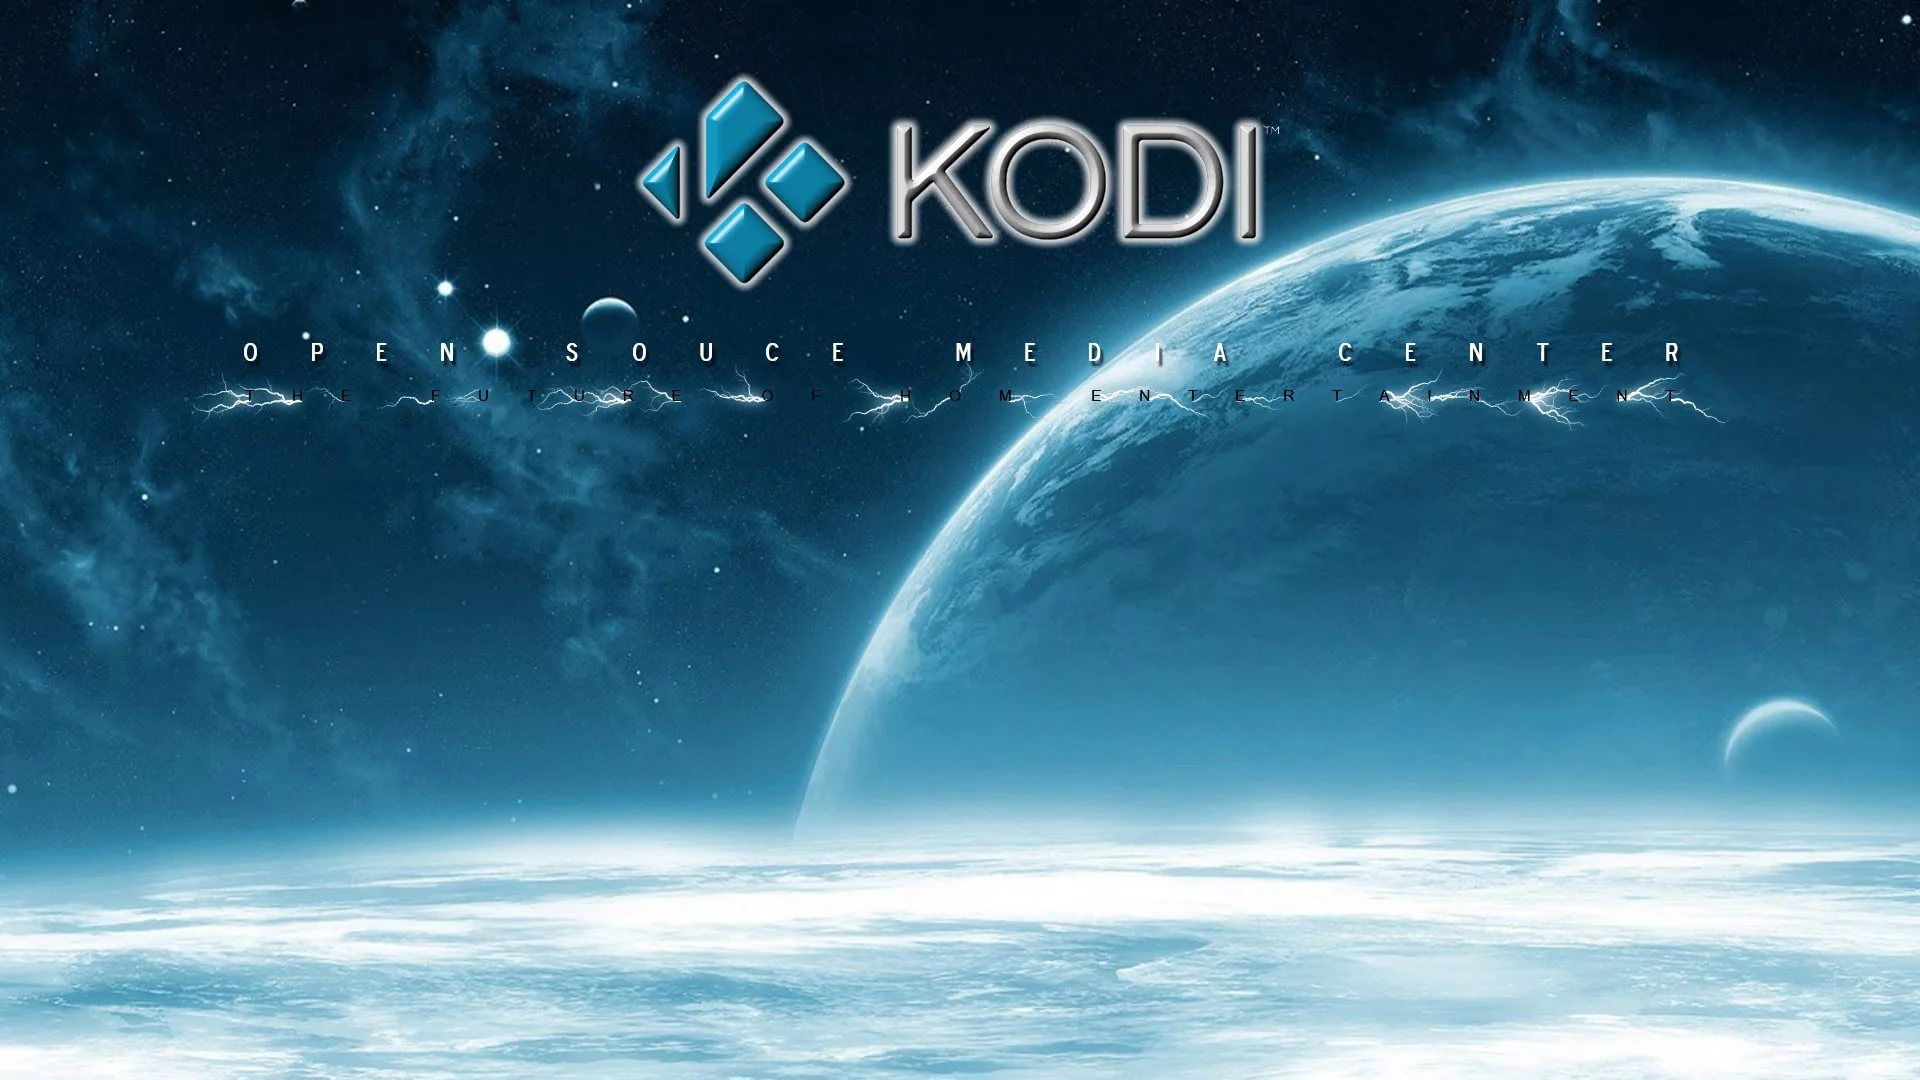 Kodi computer wallpaper